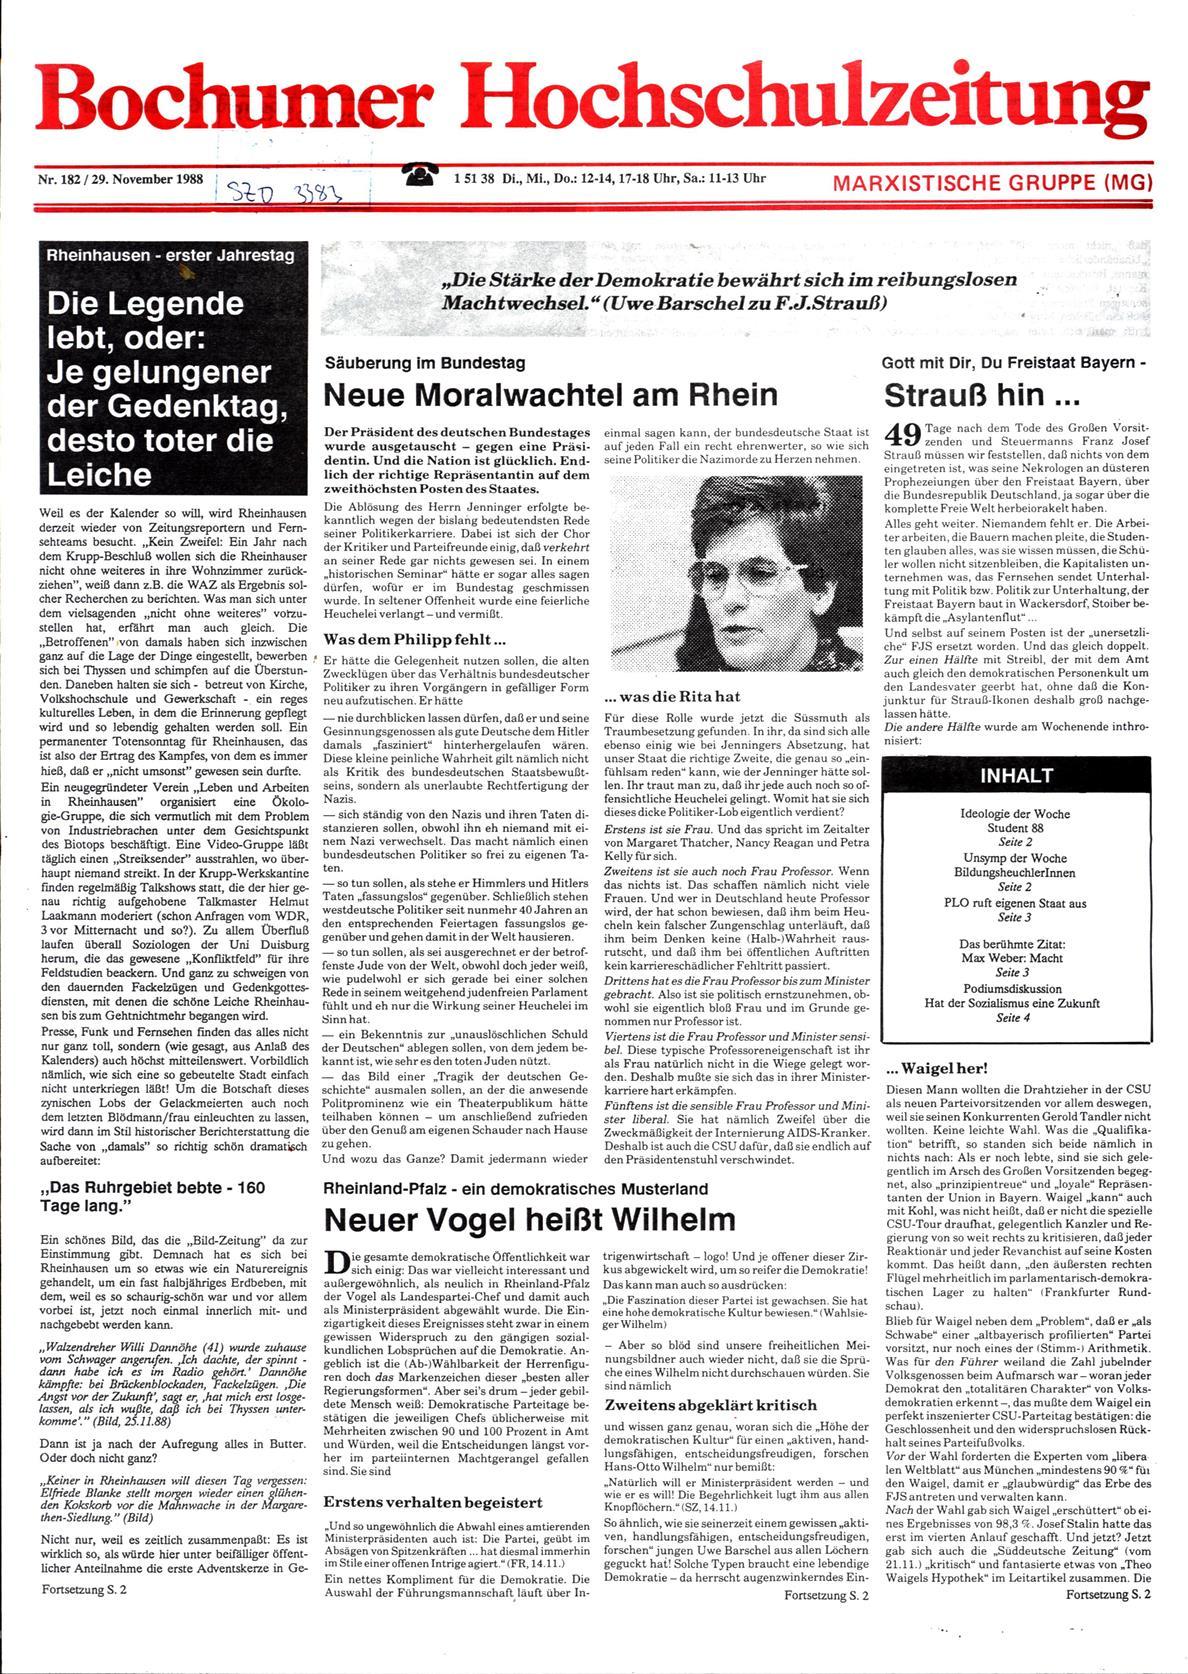 Bochum_BHZ_19881129_182_001